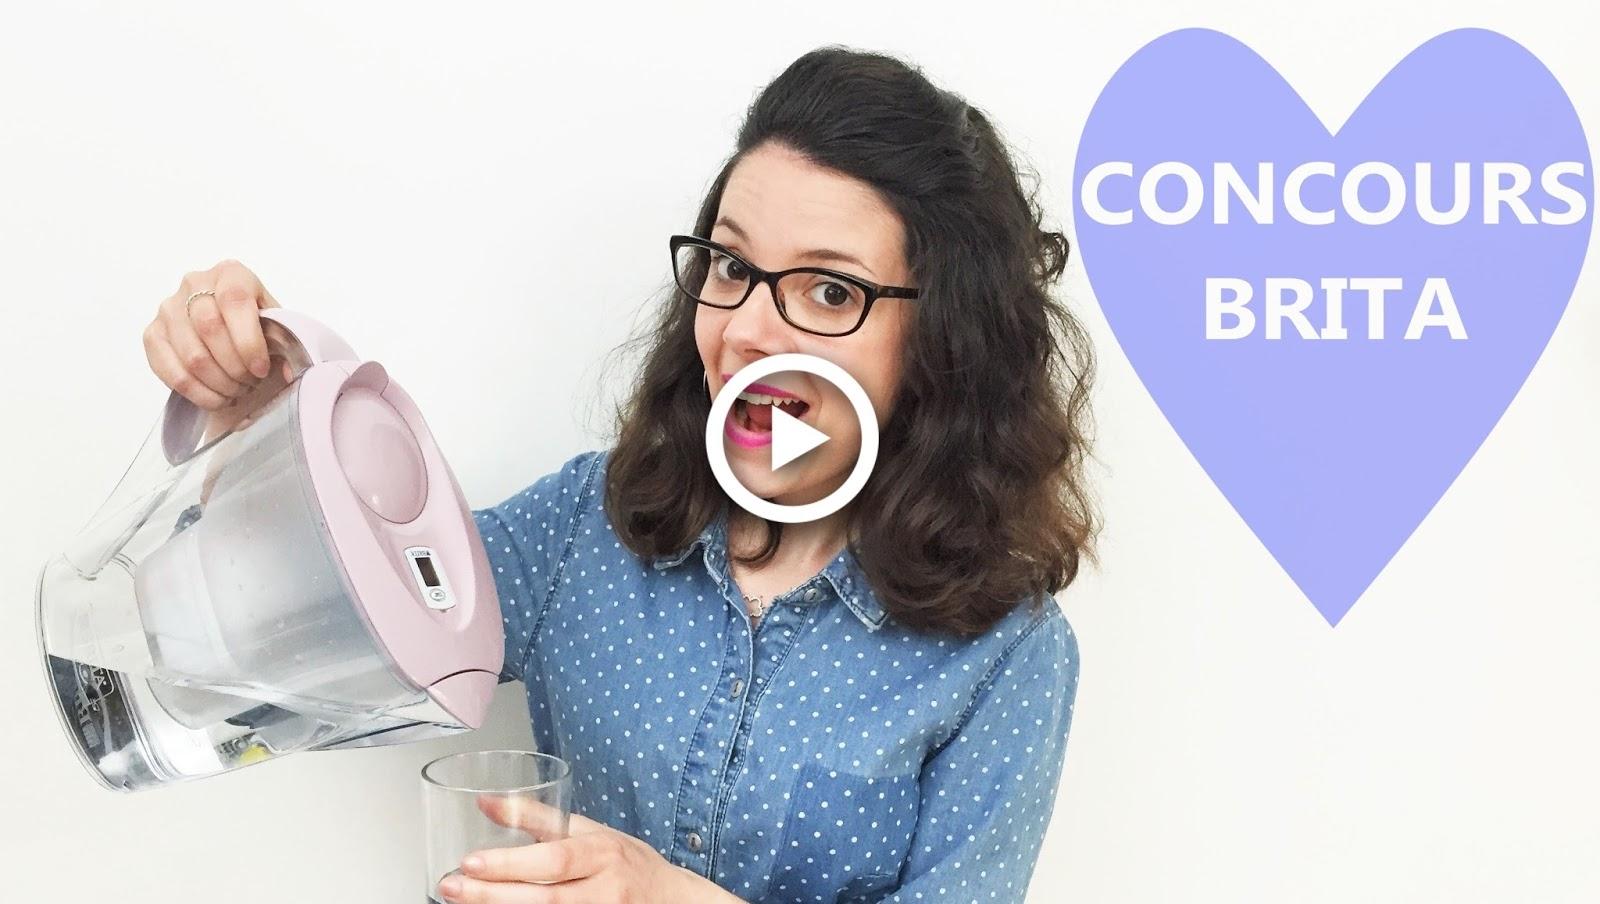 brita concours giveaway cuisine cooking kitchen deco design scandinave moderne rose pastel marella eau water économie carafe filtrante à gagner youtube facebook